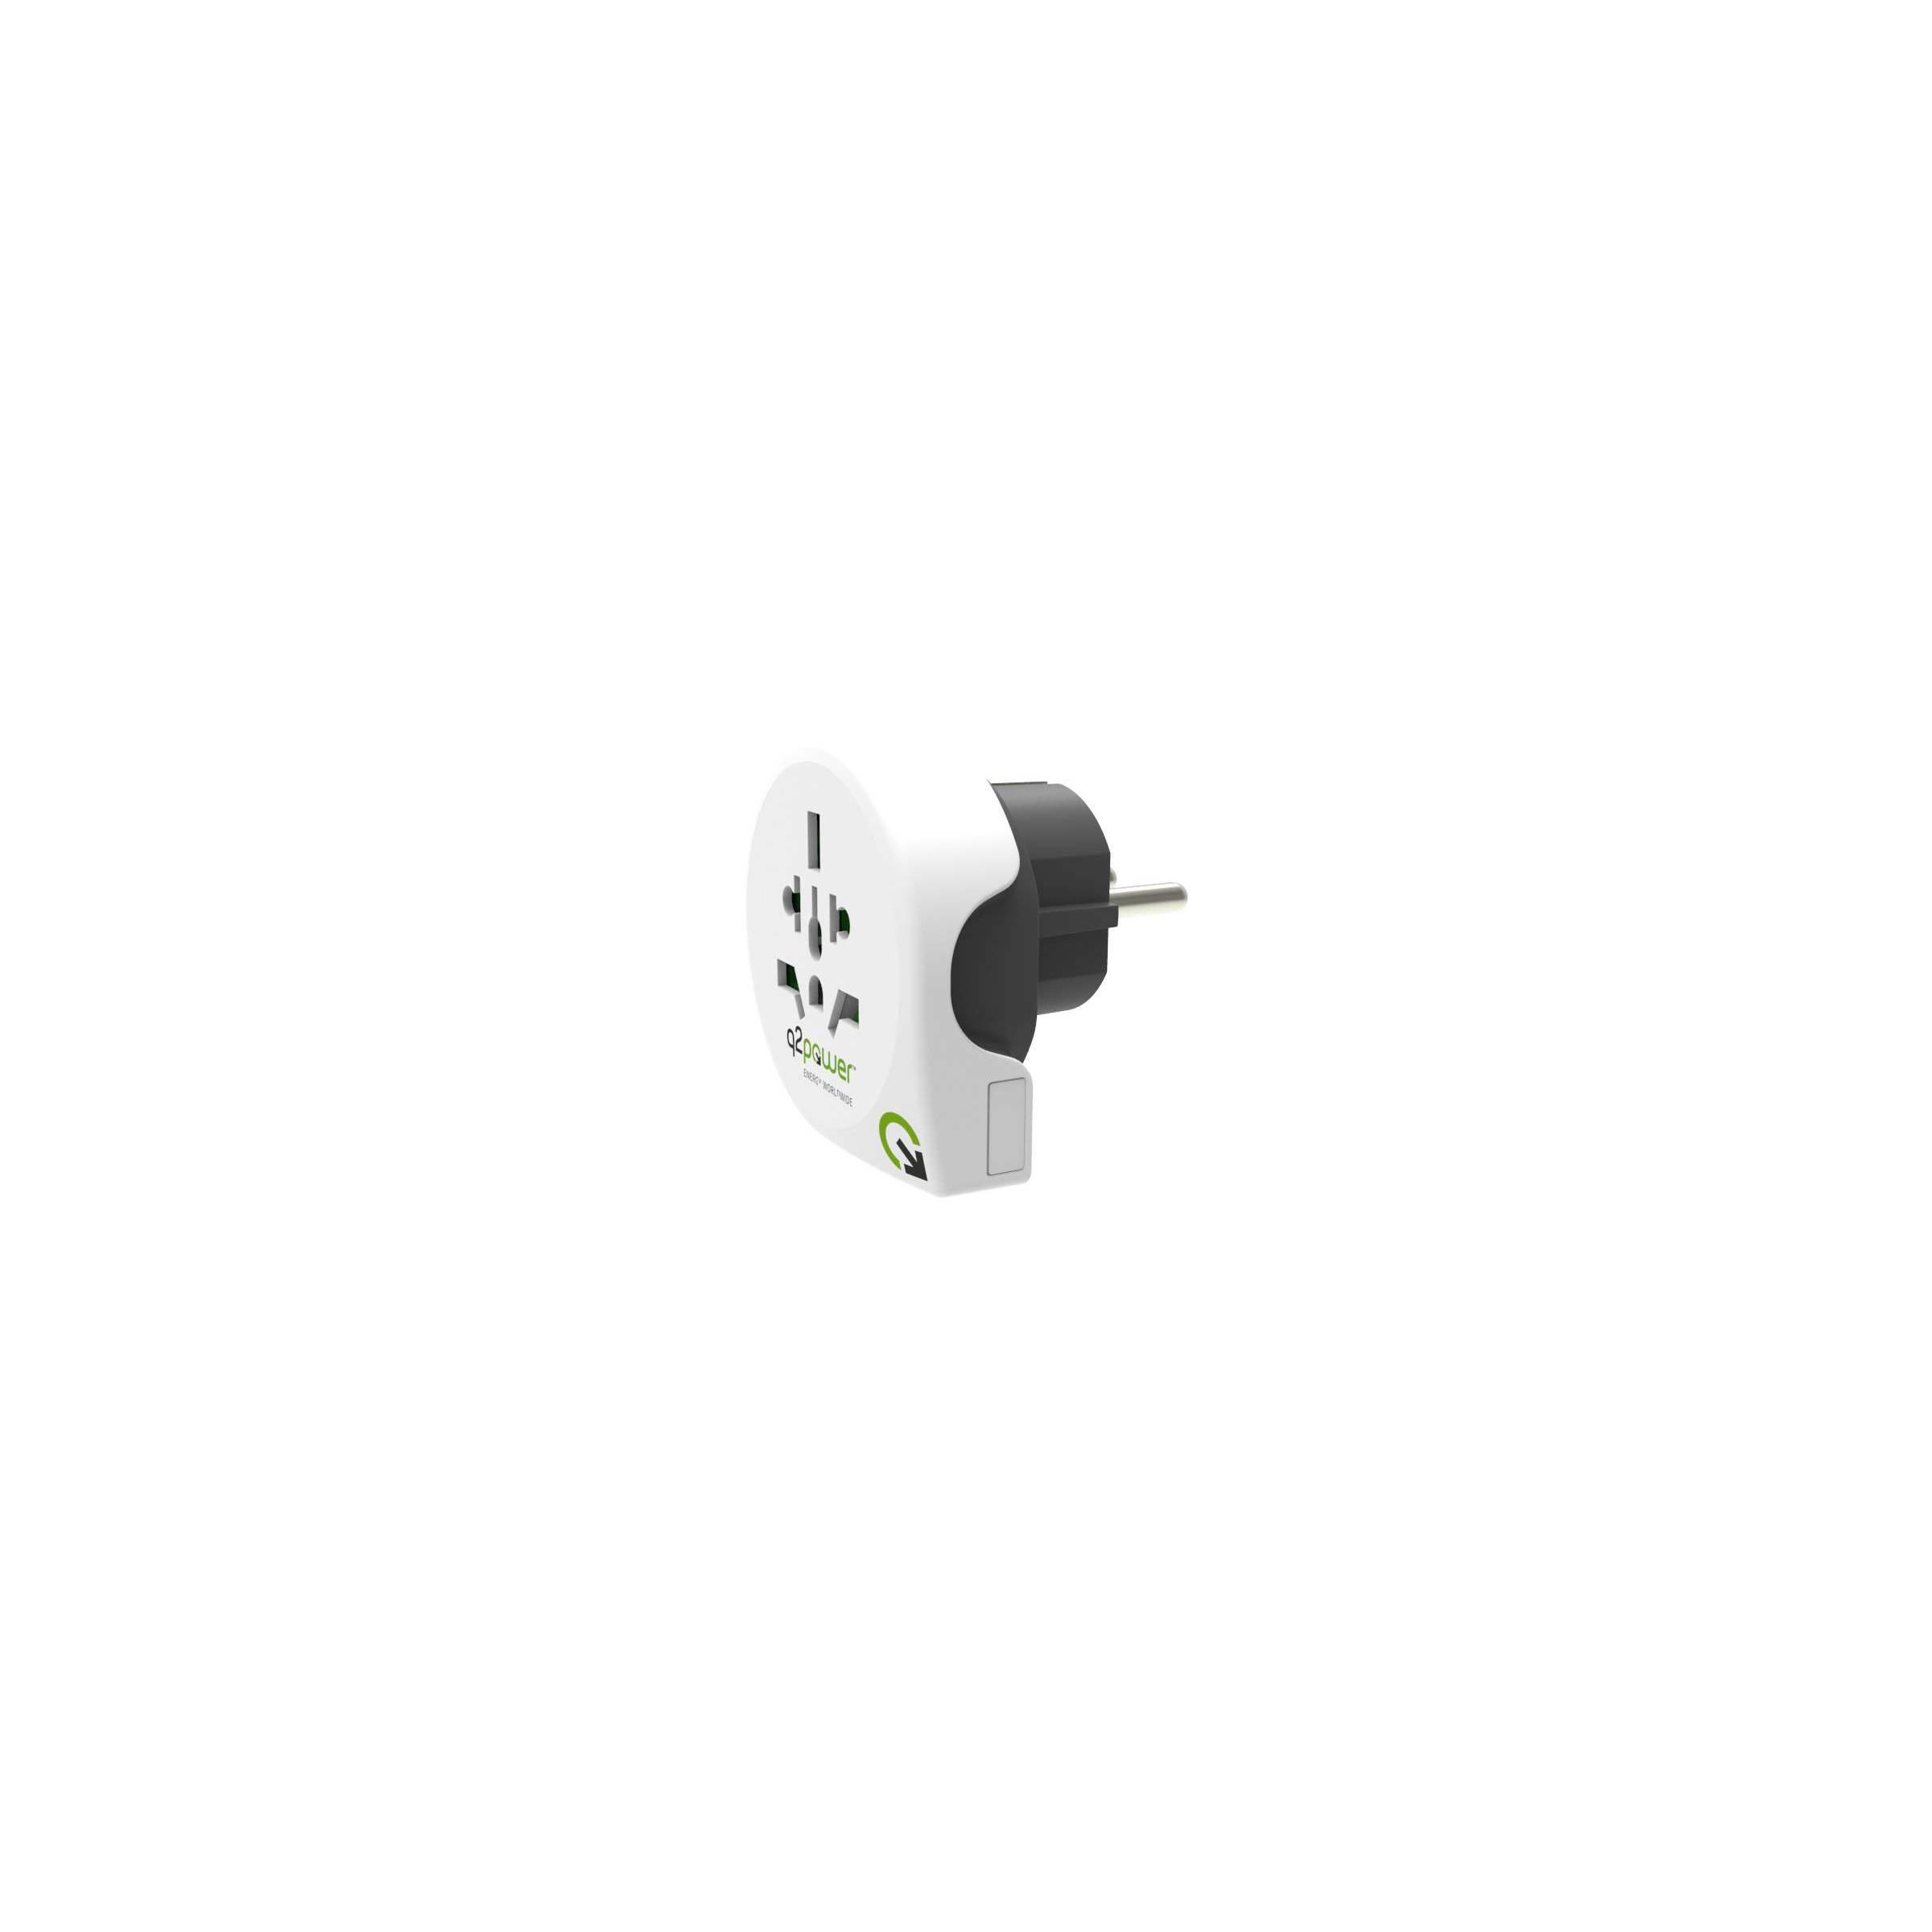 q2power – Q2power eu til uk/eu rejse adapter version europæisk stik fra mackabler.dk